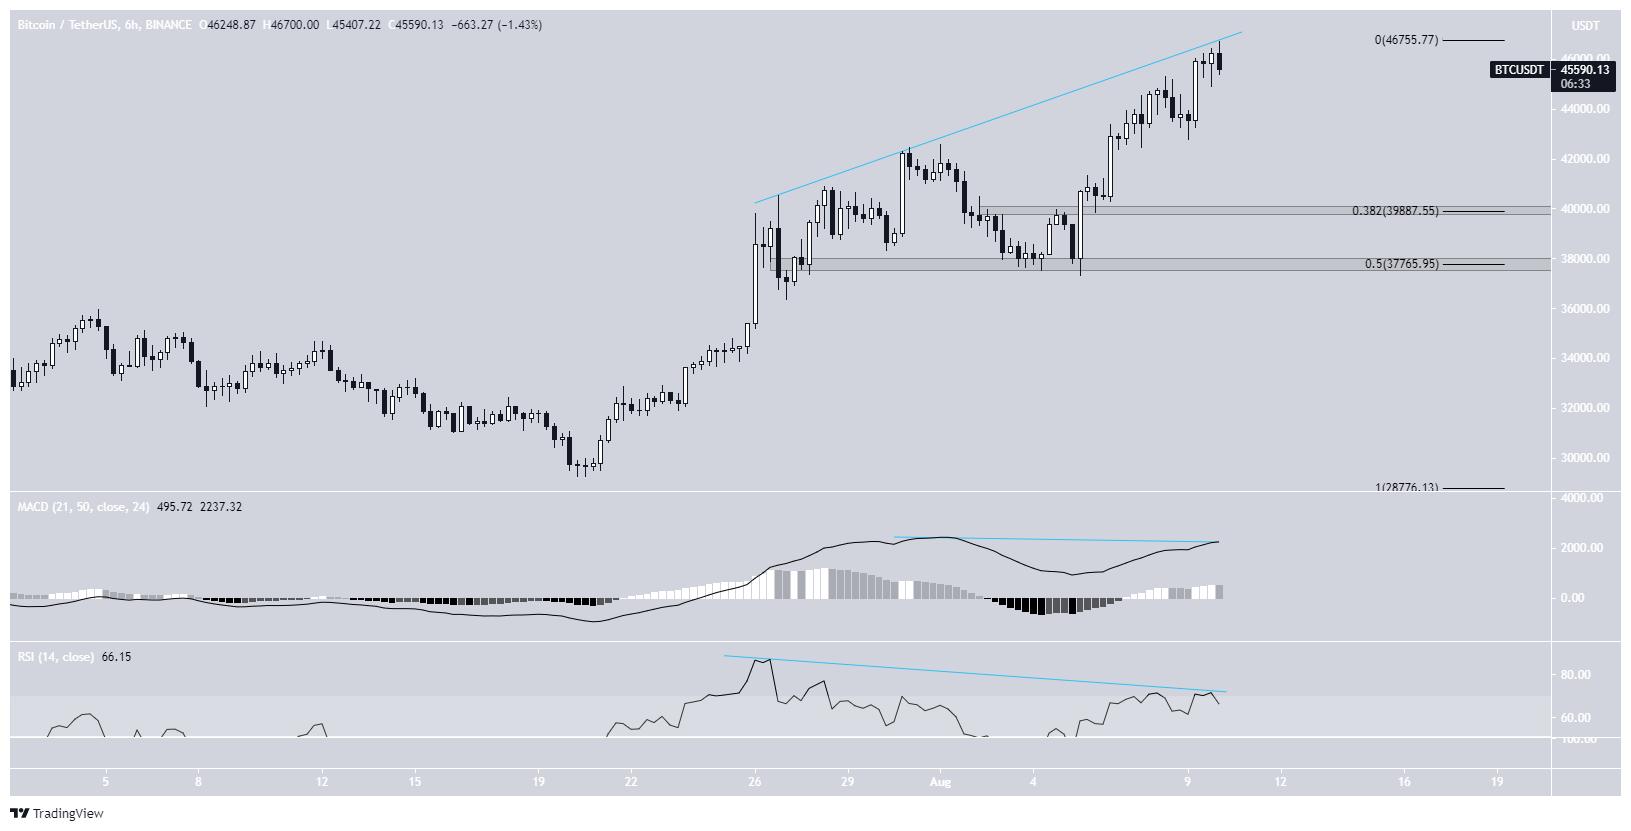 BTC bearish divergence